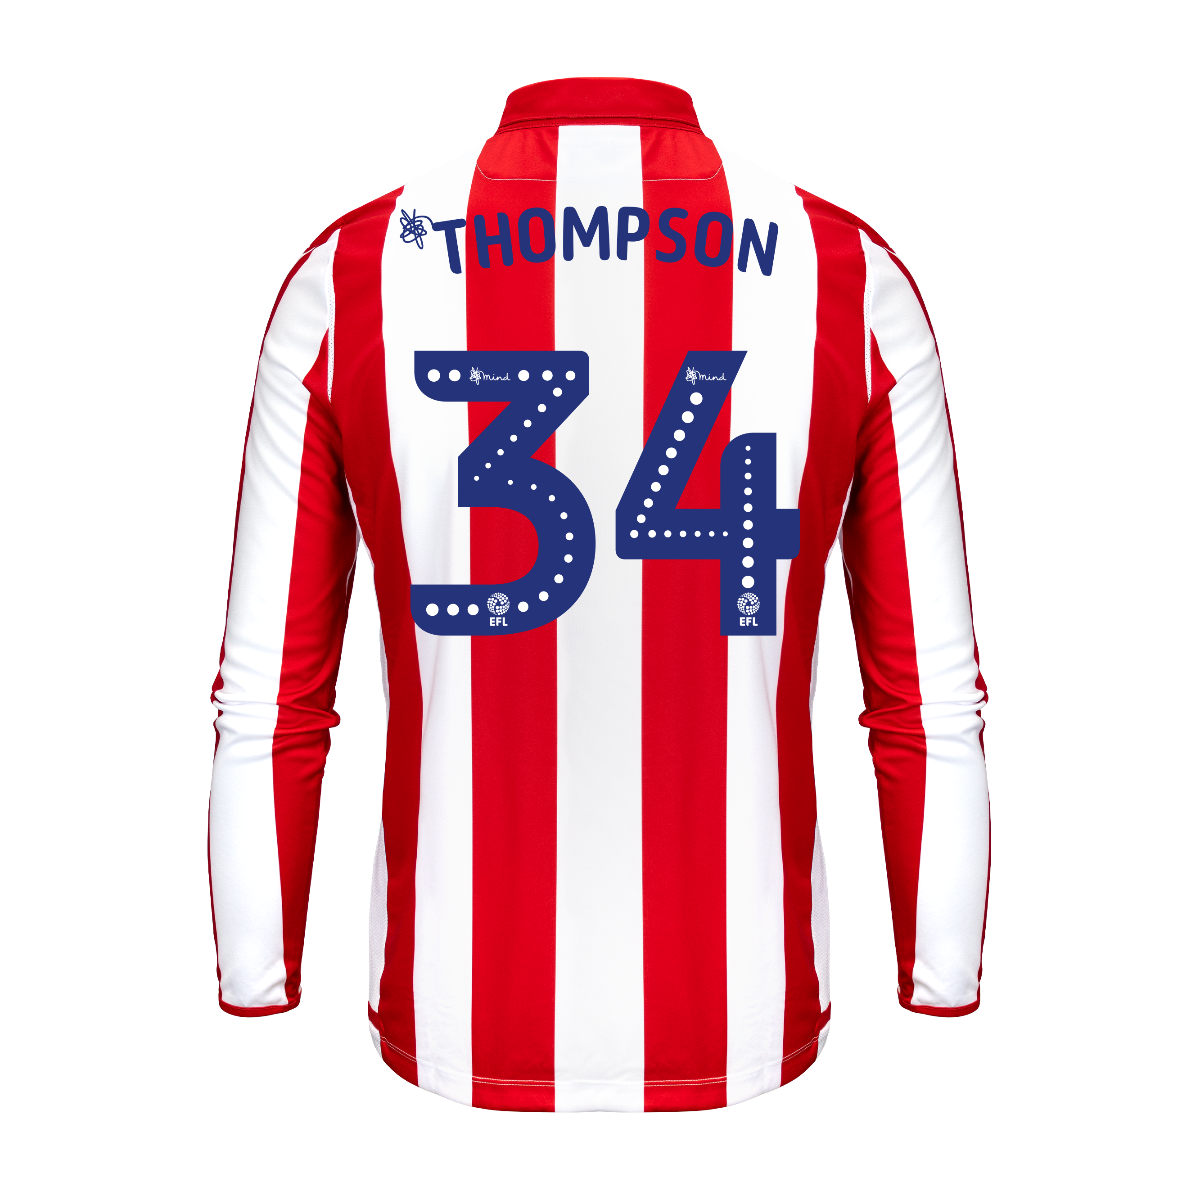 2019/20 Adult Home LS Shirt - Thompson